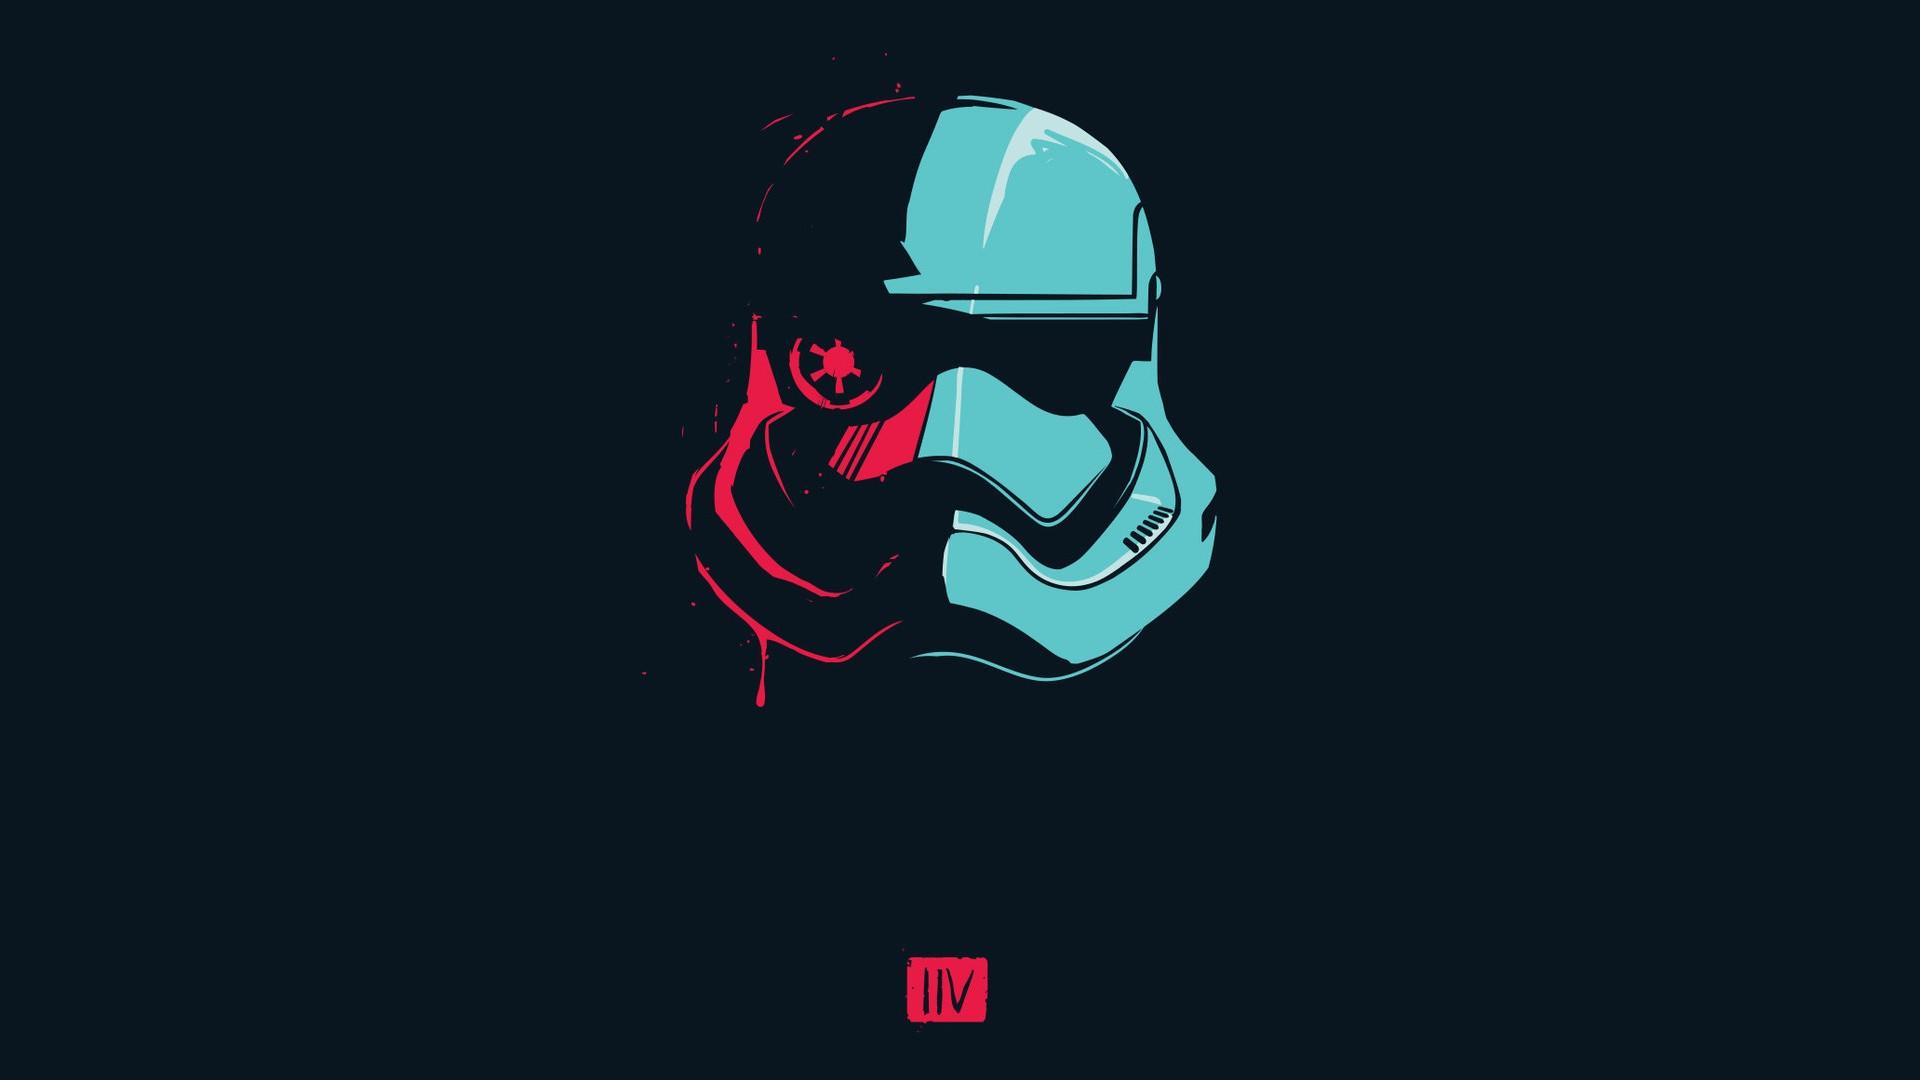 wallpaper illustration star wars logo graphic design